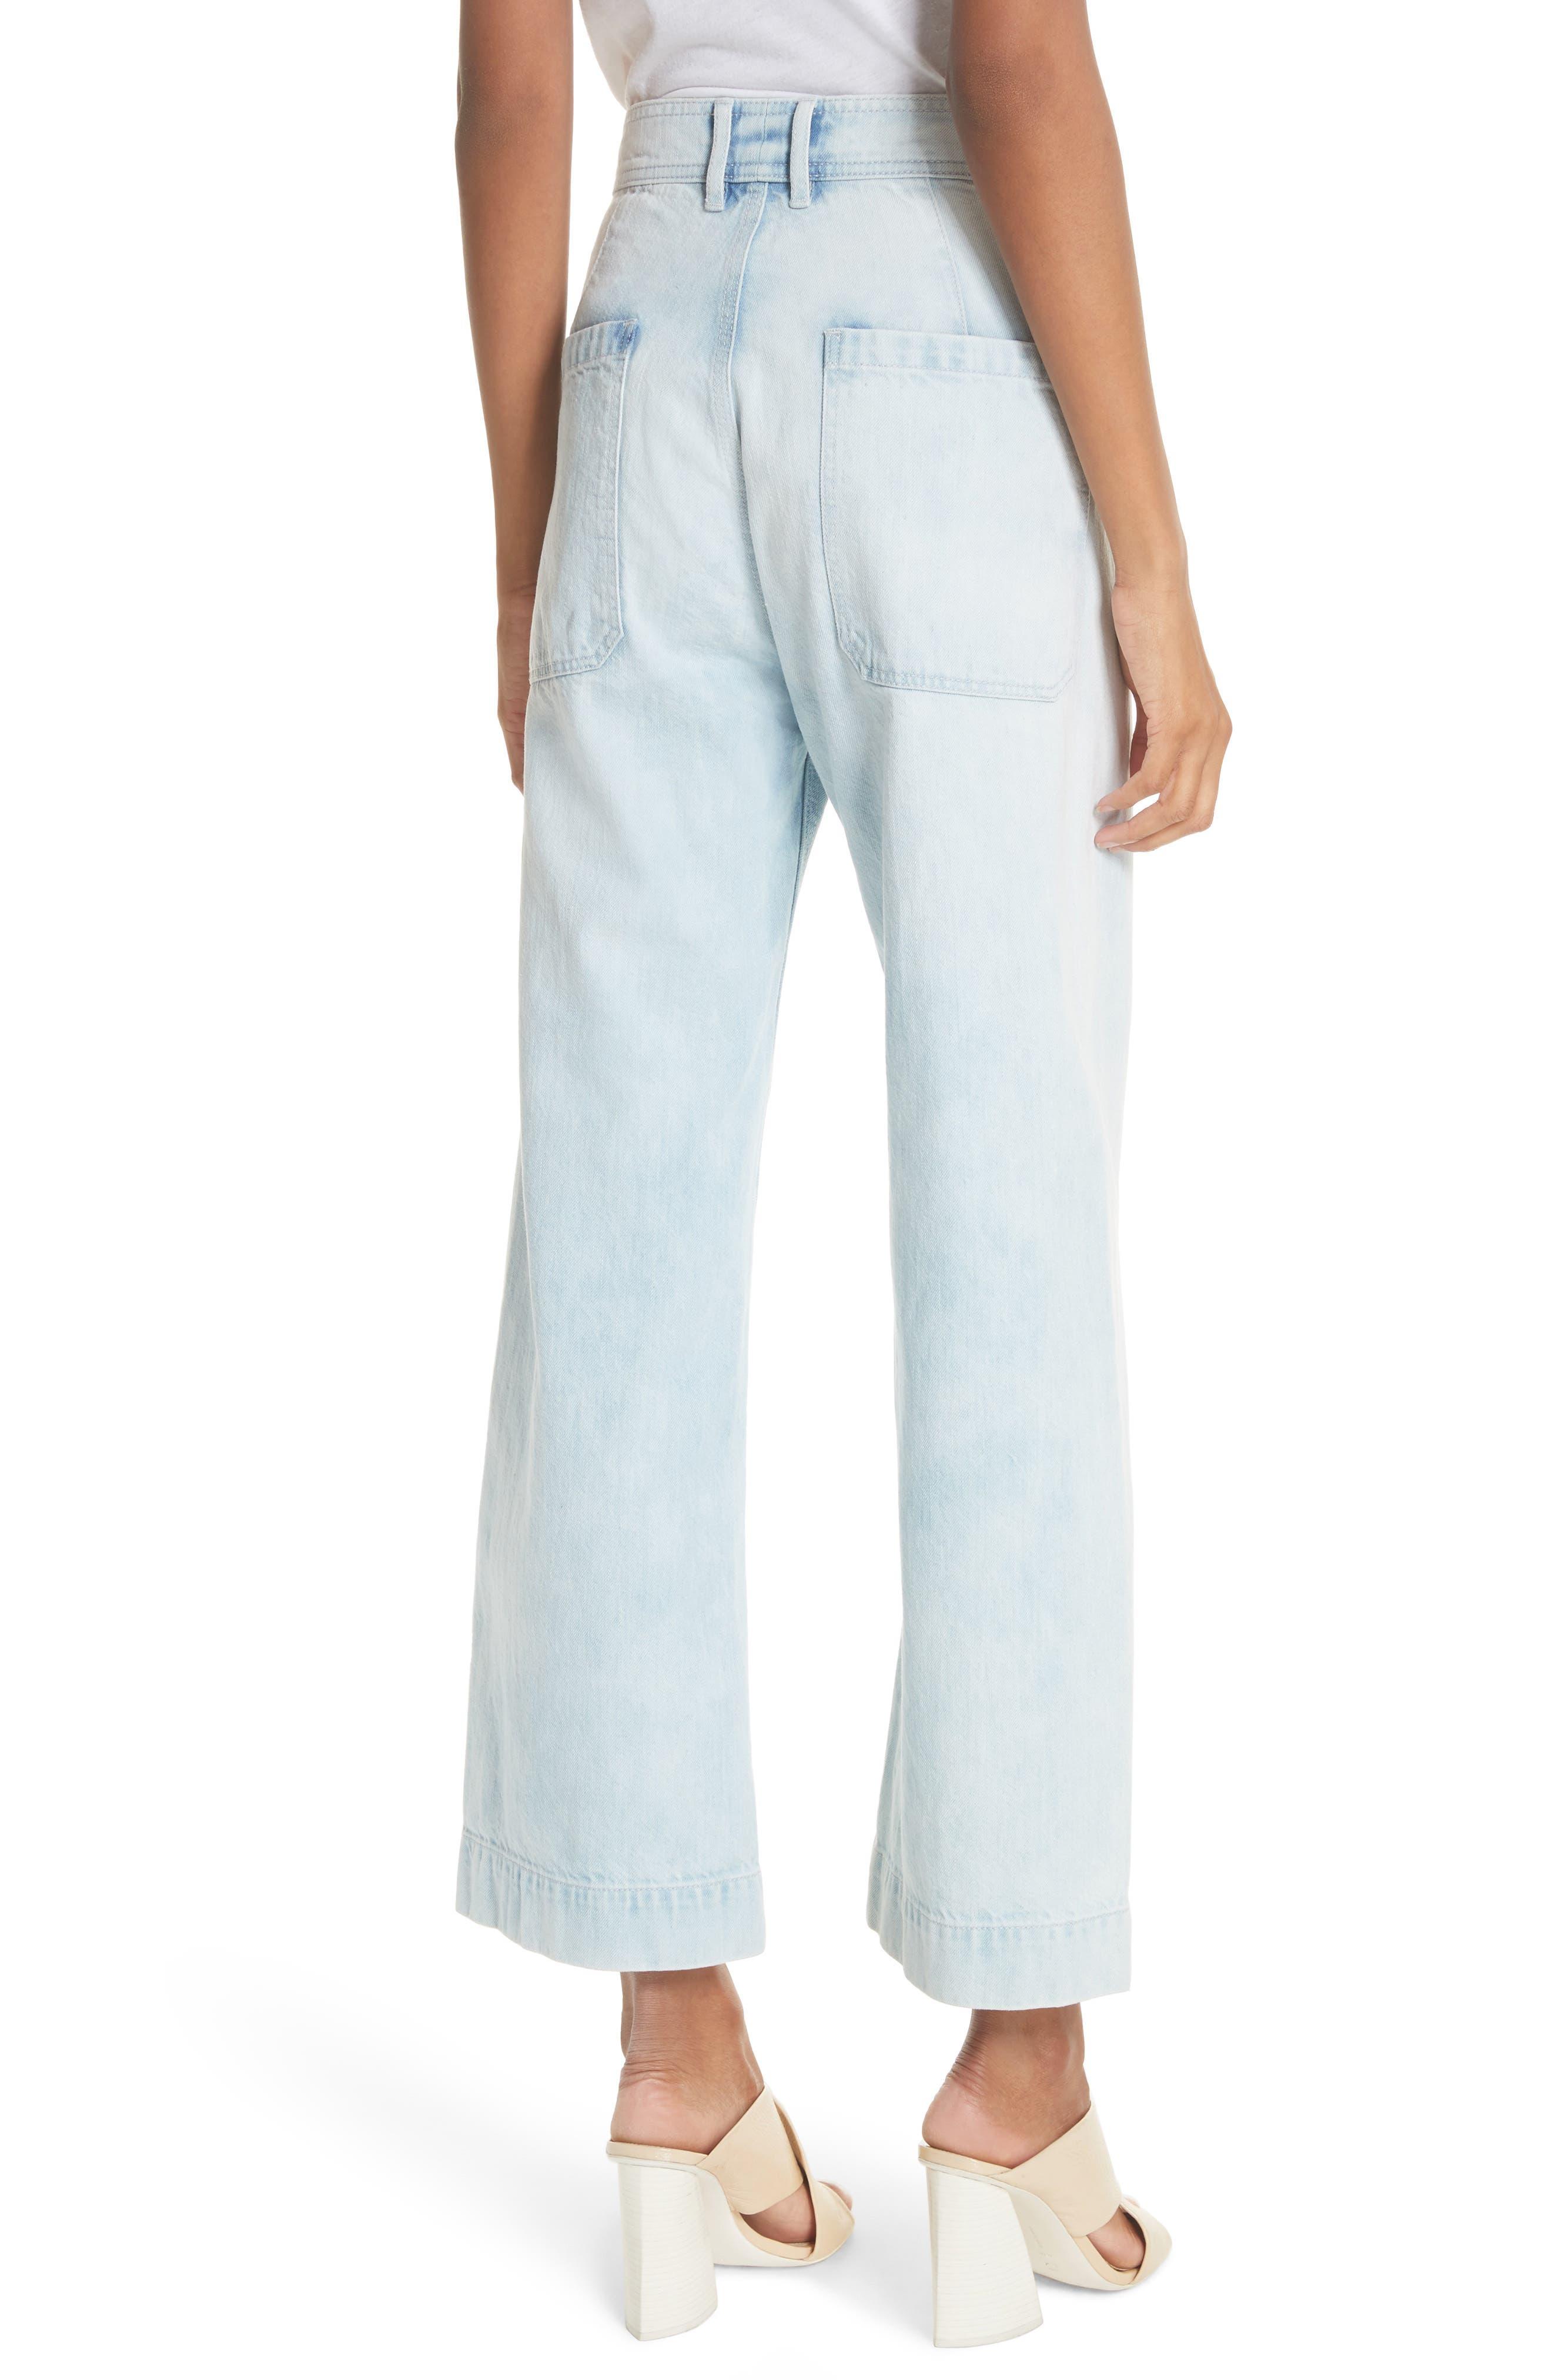 Alternate Image 2  - La Vie Rebecca Taylor Crop Wide Leg Jeans (Nuage Wash)